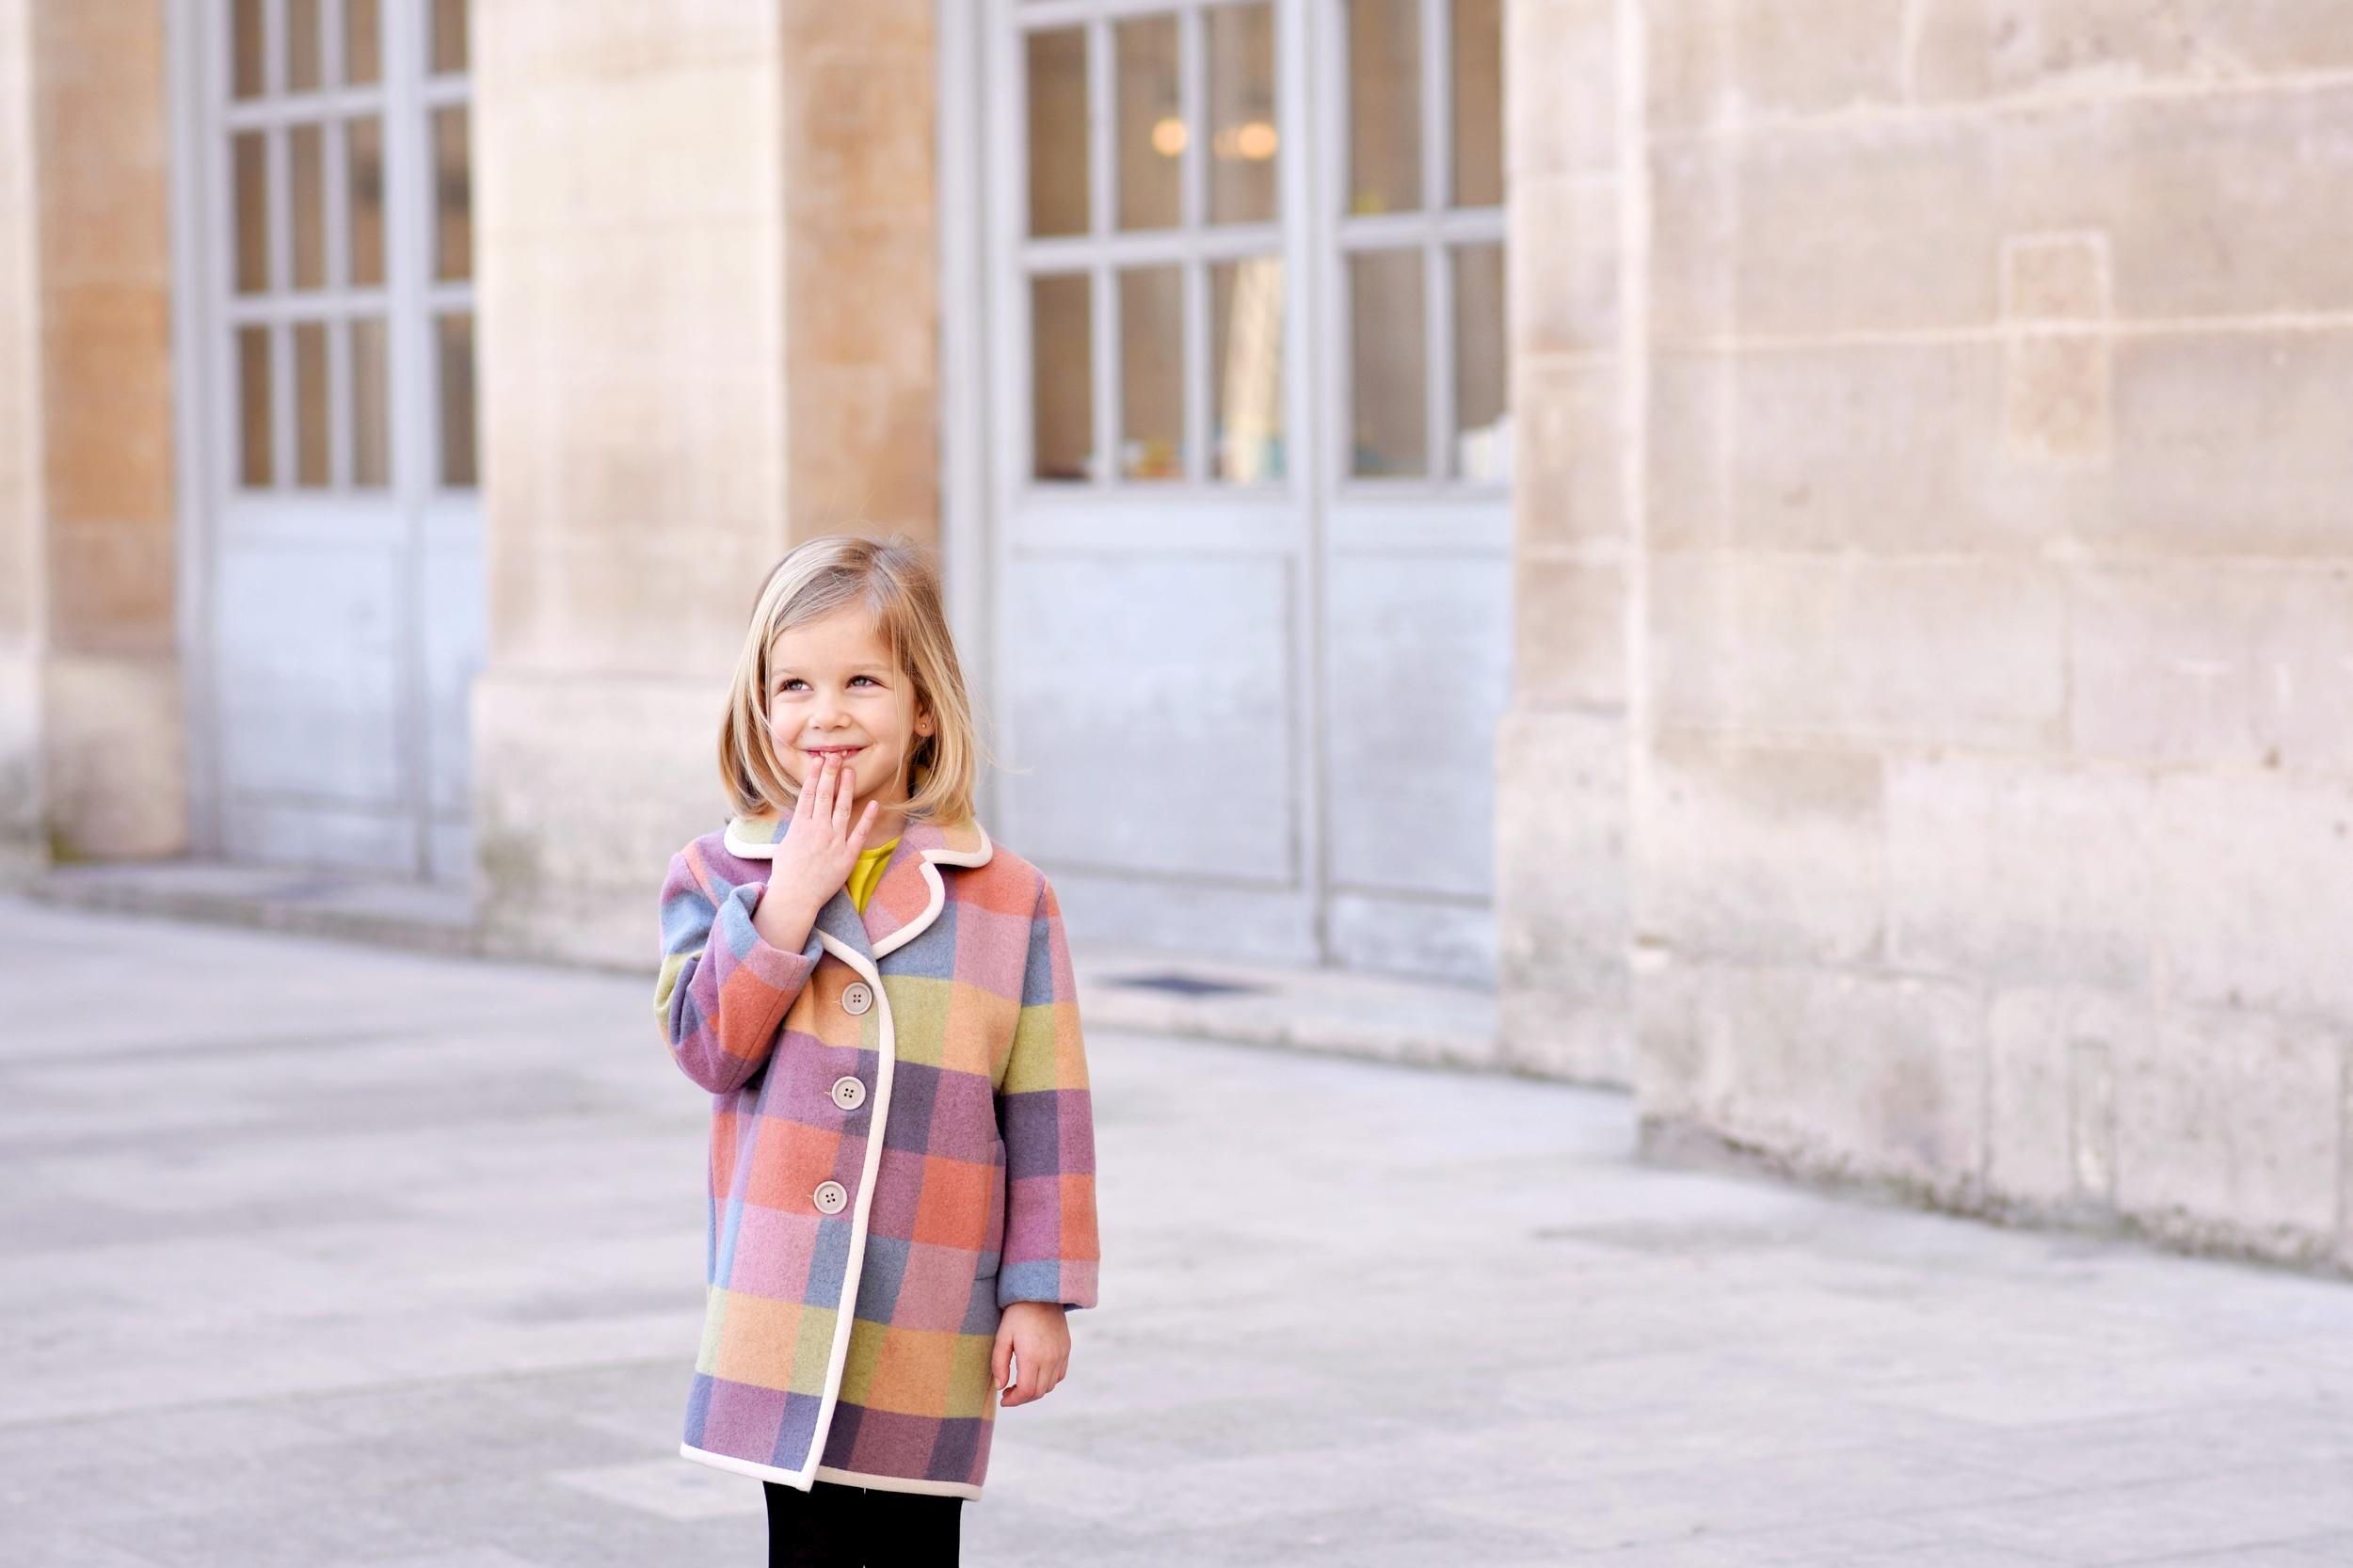 Enfant Street Style by Gina Kim Photography mini preen coat